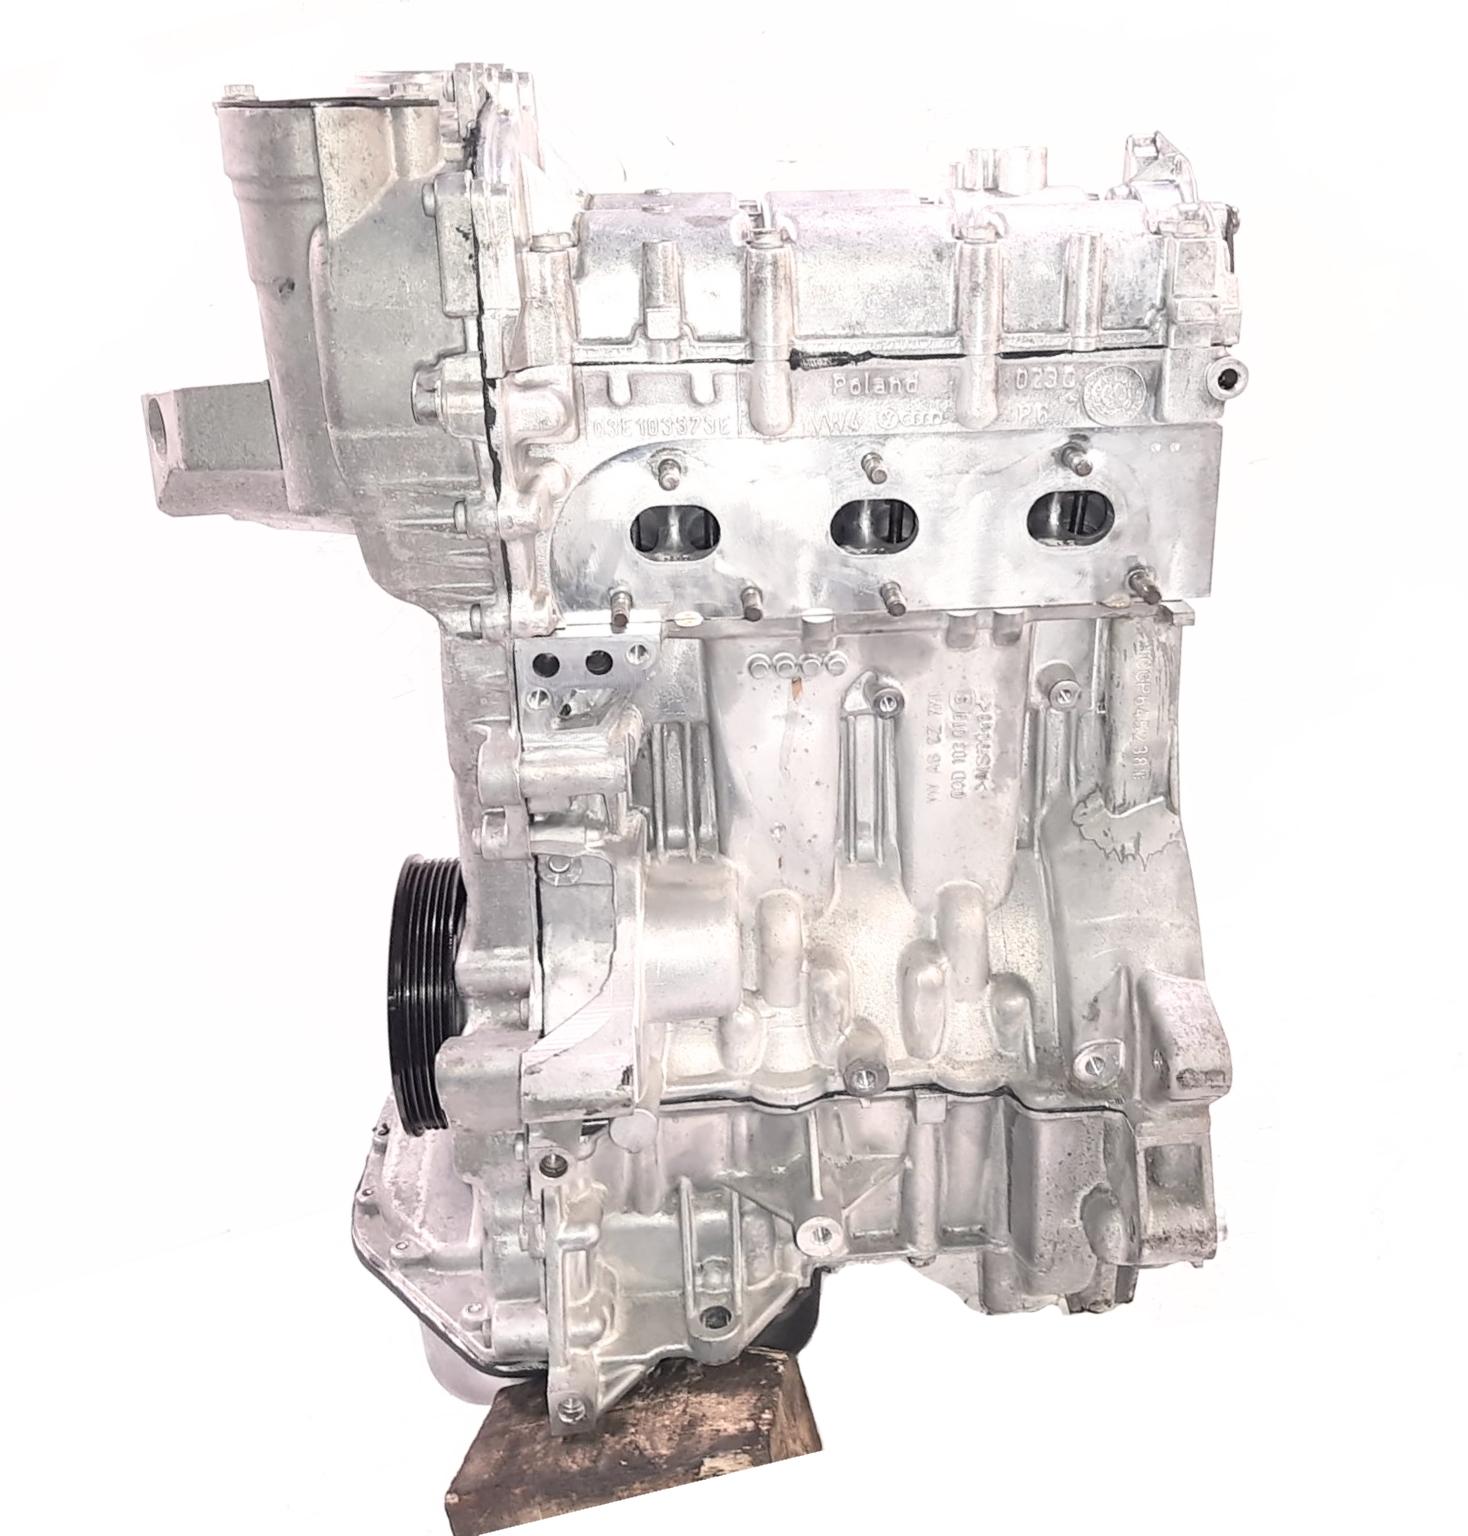 Motor Überholt für VW Skoda Seat Polo 1,2 CGP CGPA CGPB Kolben Kettensatz NEU